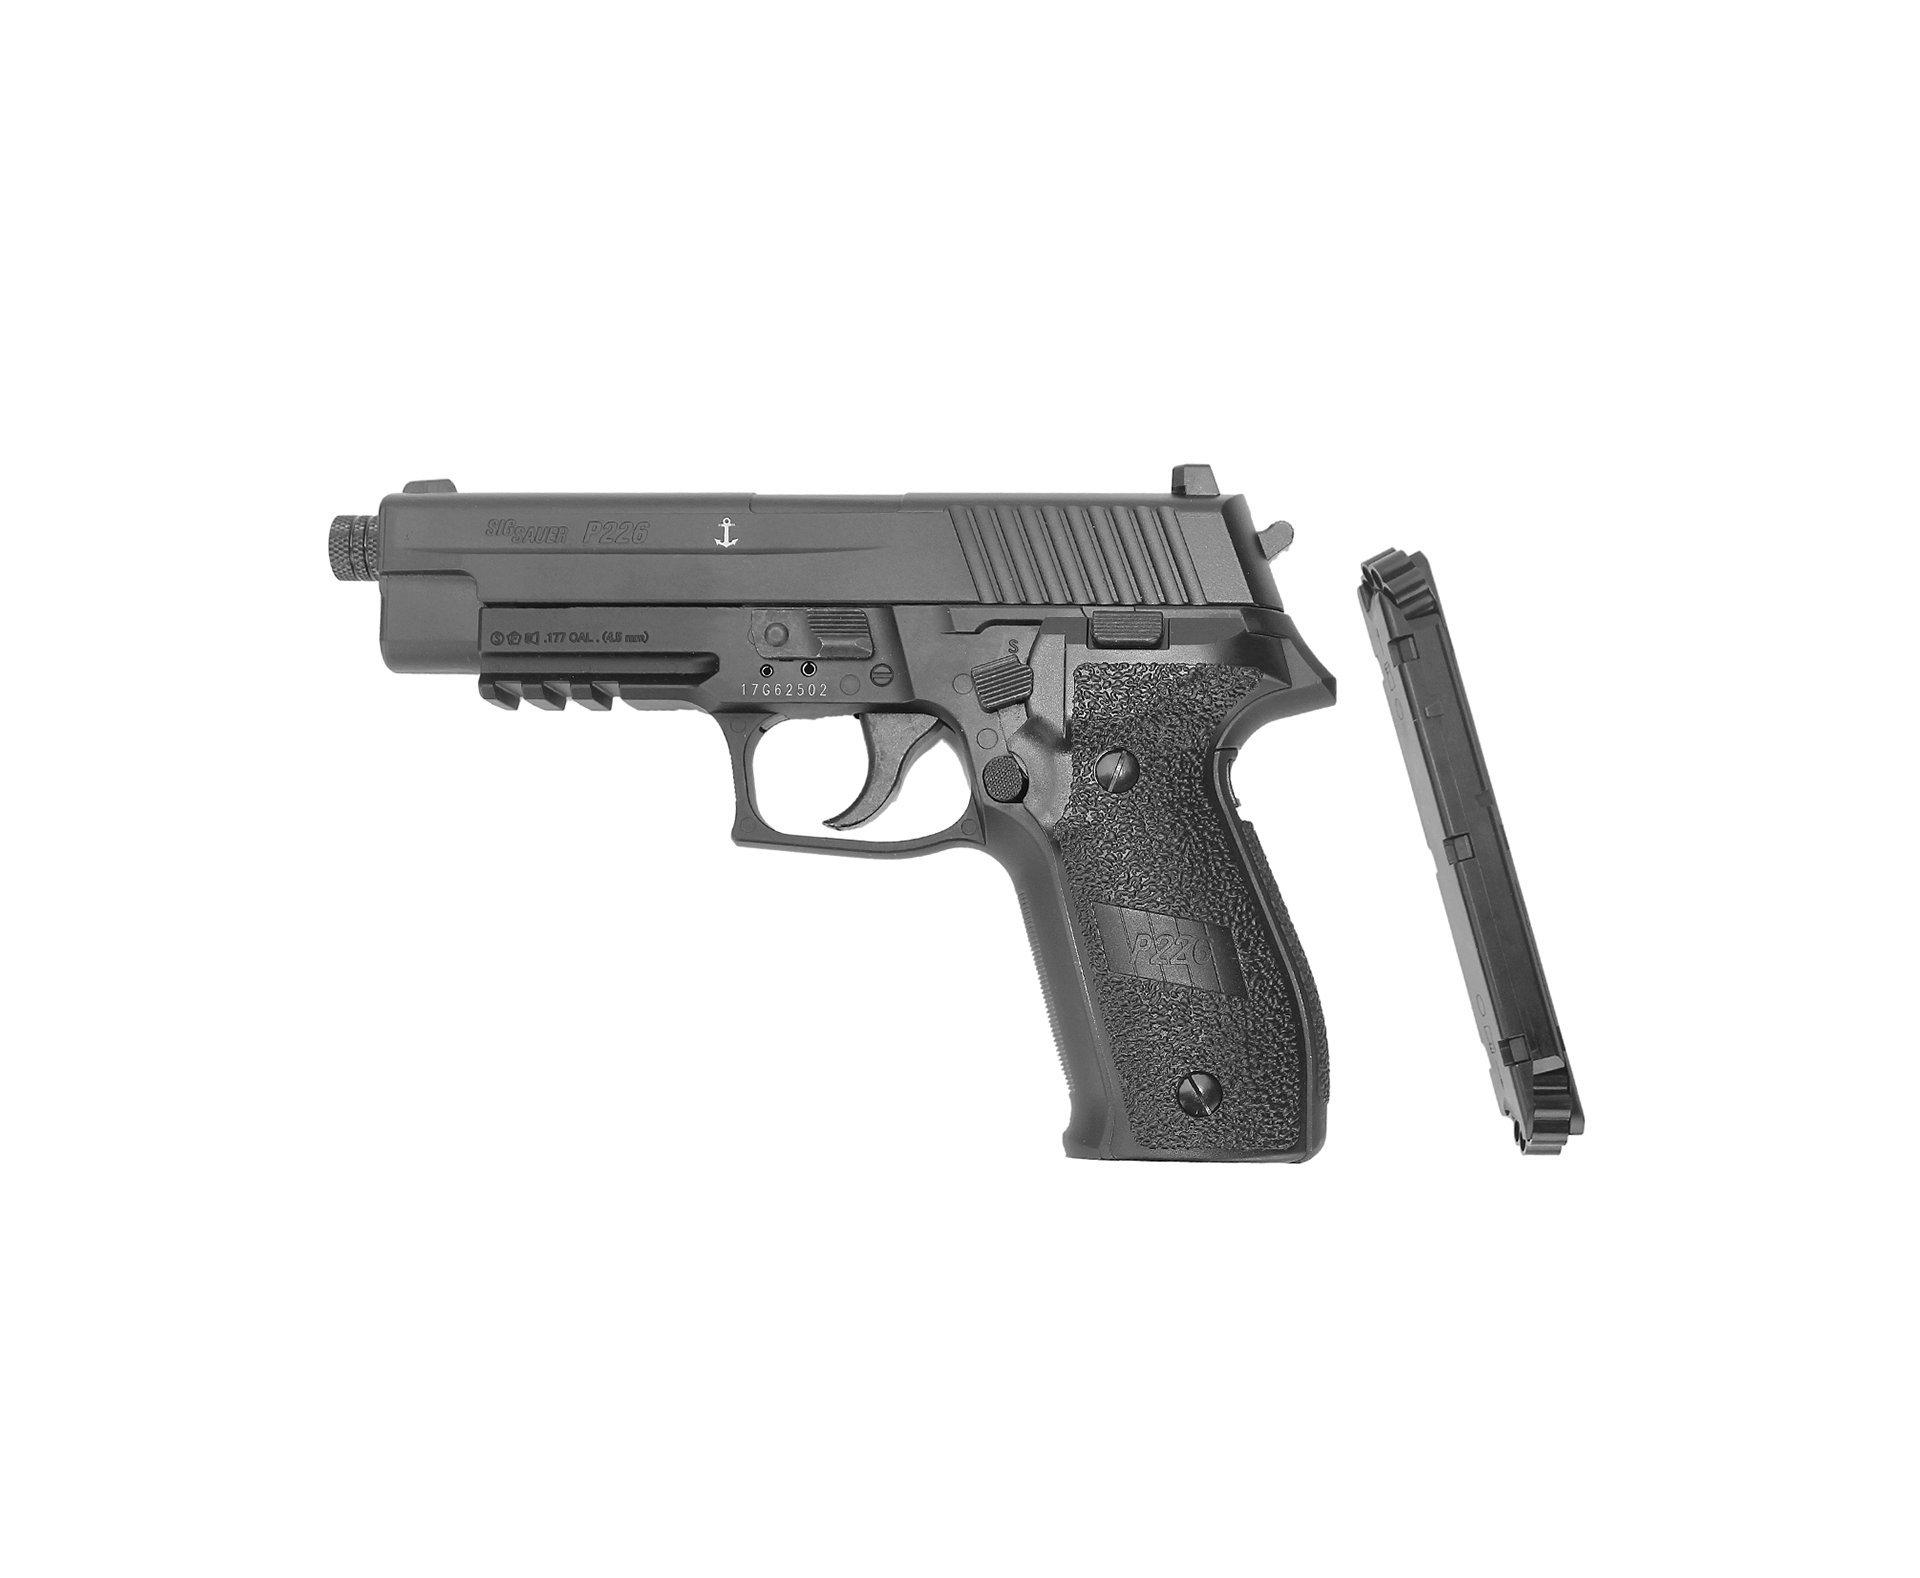 Pistola Pressão Sig Sauer P226 Co2 Full Metal Chumbinho 4,5mm 16 Tiros (8+8) Blowback